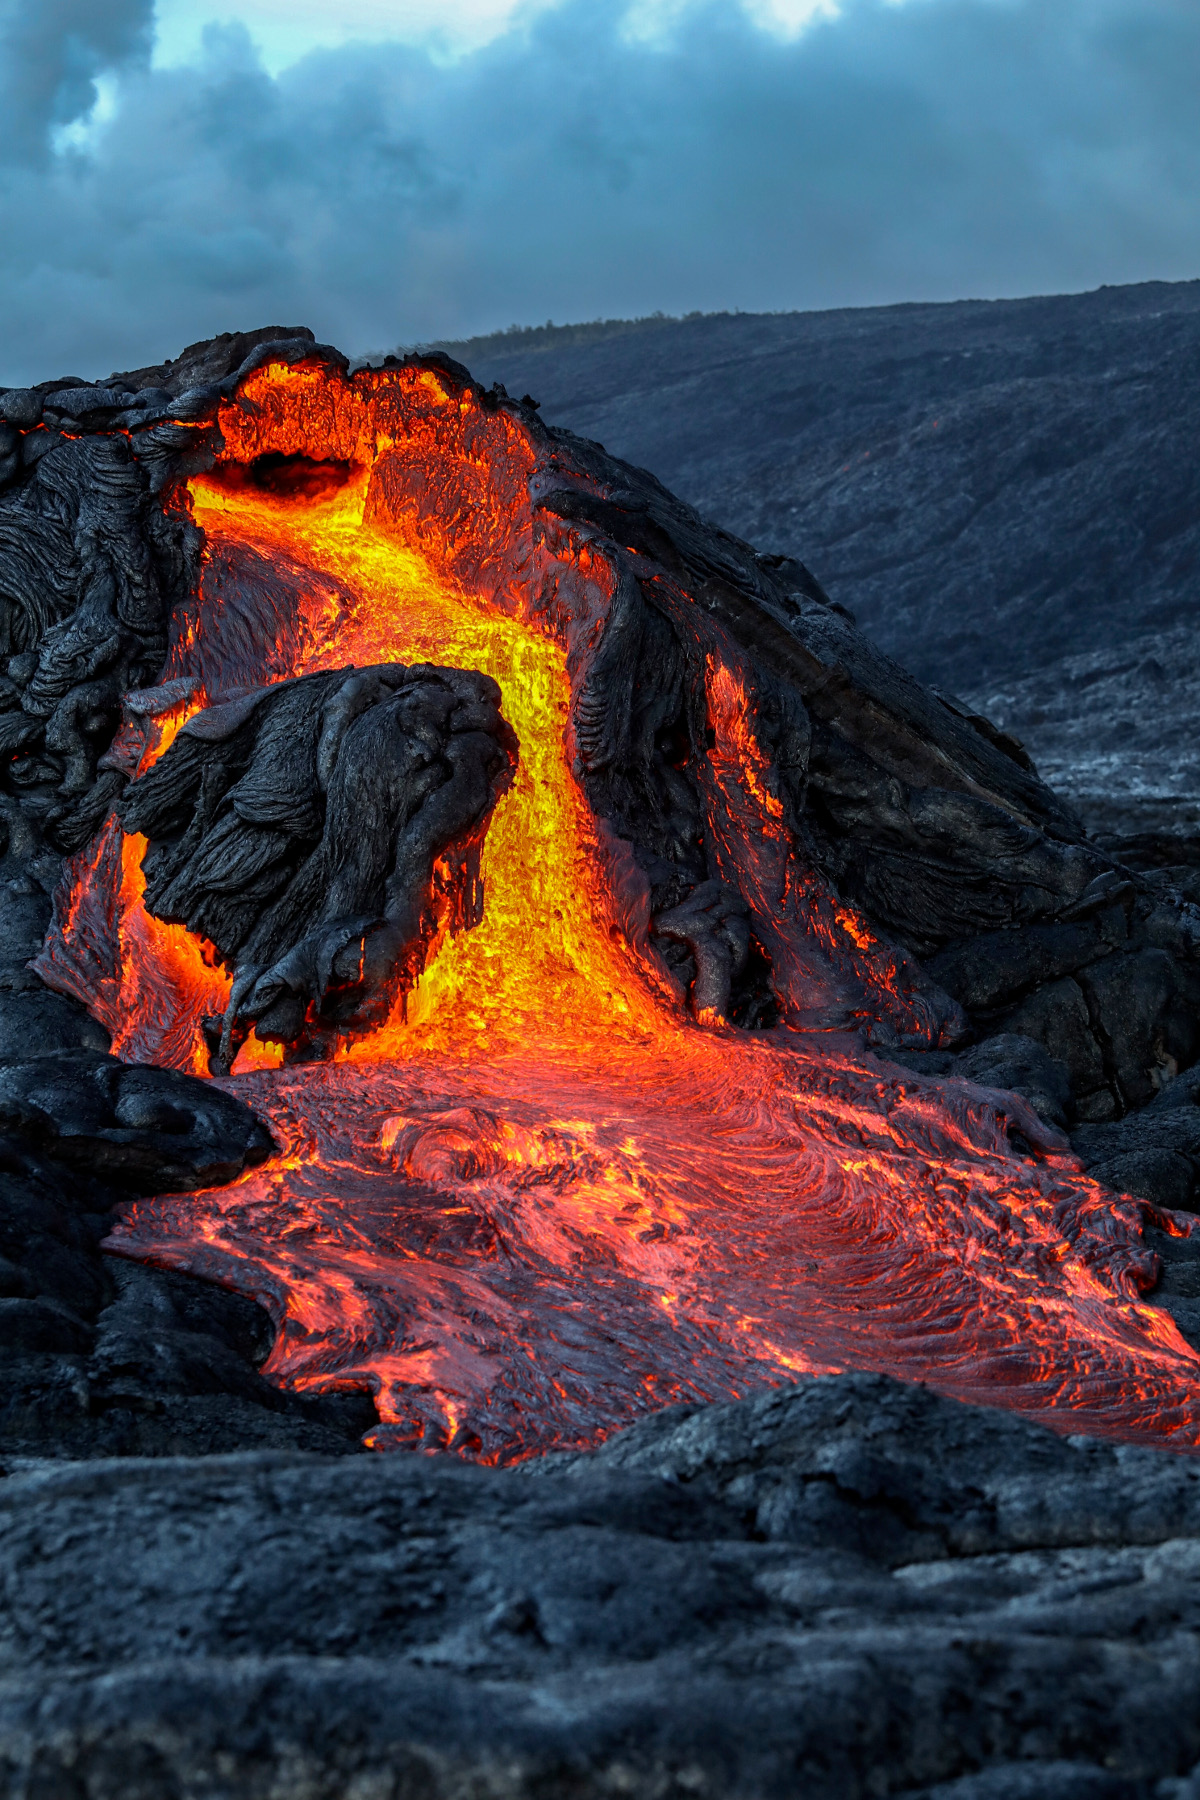 Video Kilauea Volcano East Rift Zone Eruption Update